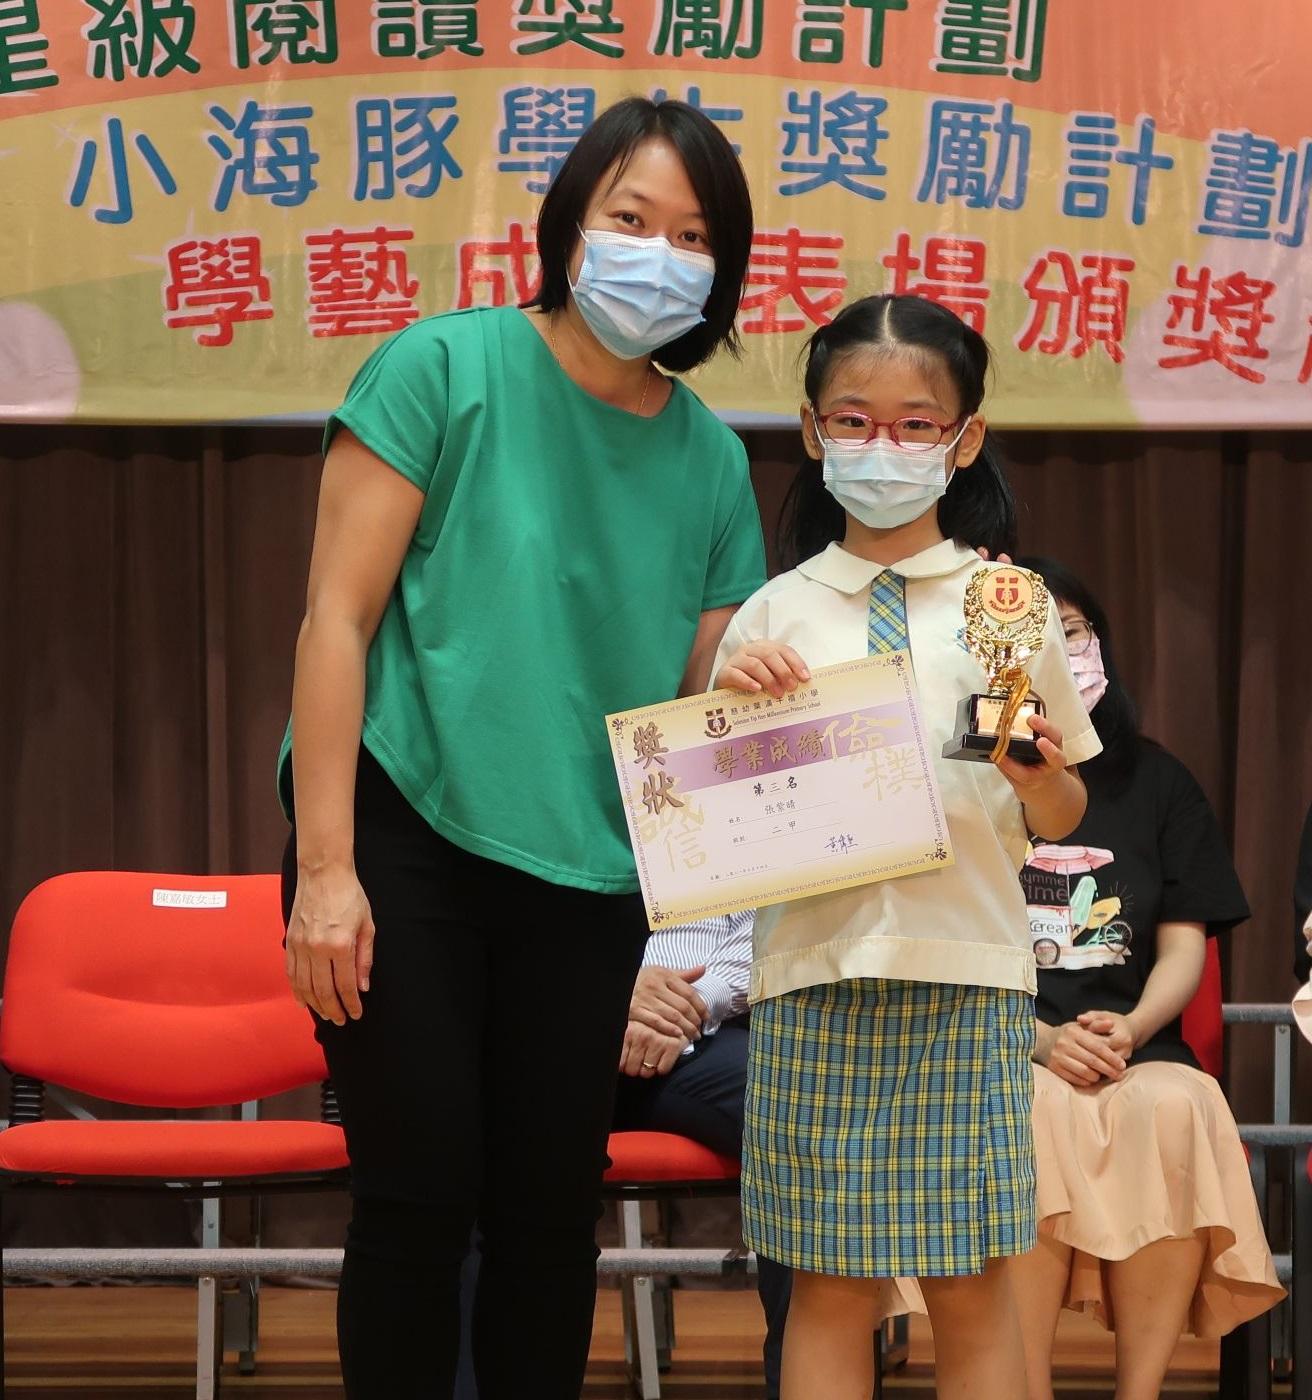 https://syh.edu.hk/sites/default/files/img_5401.jpg